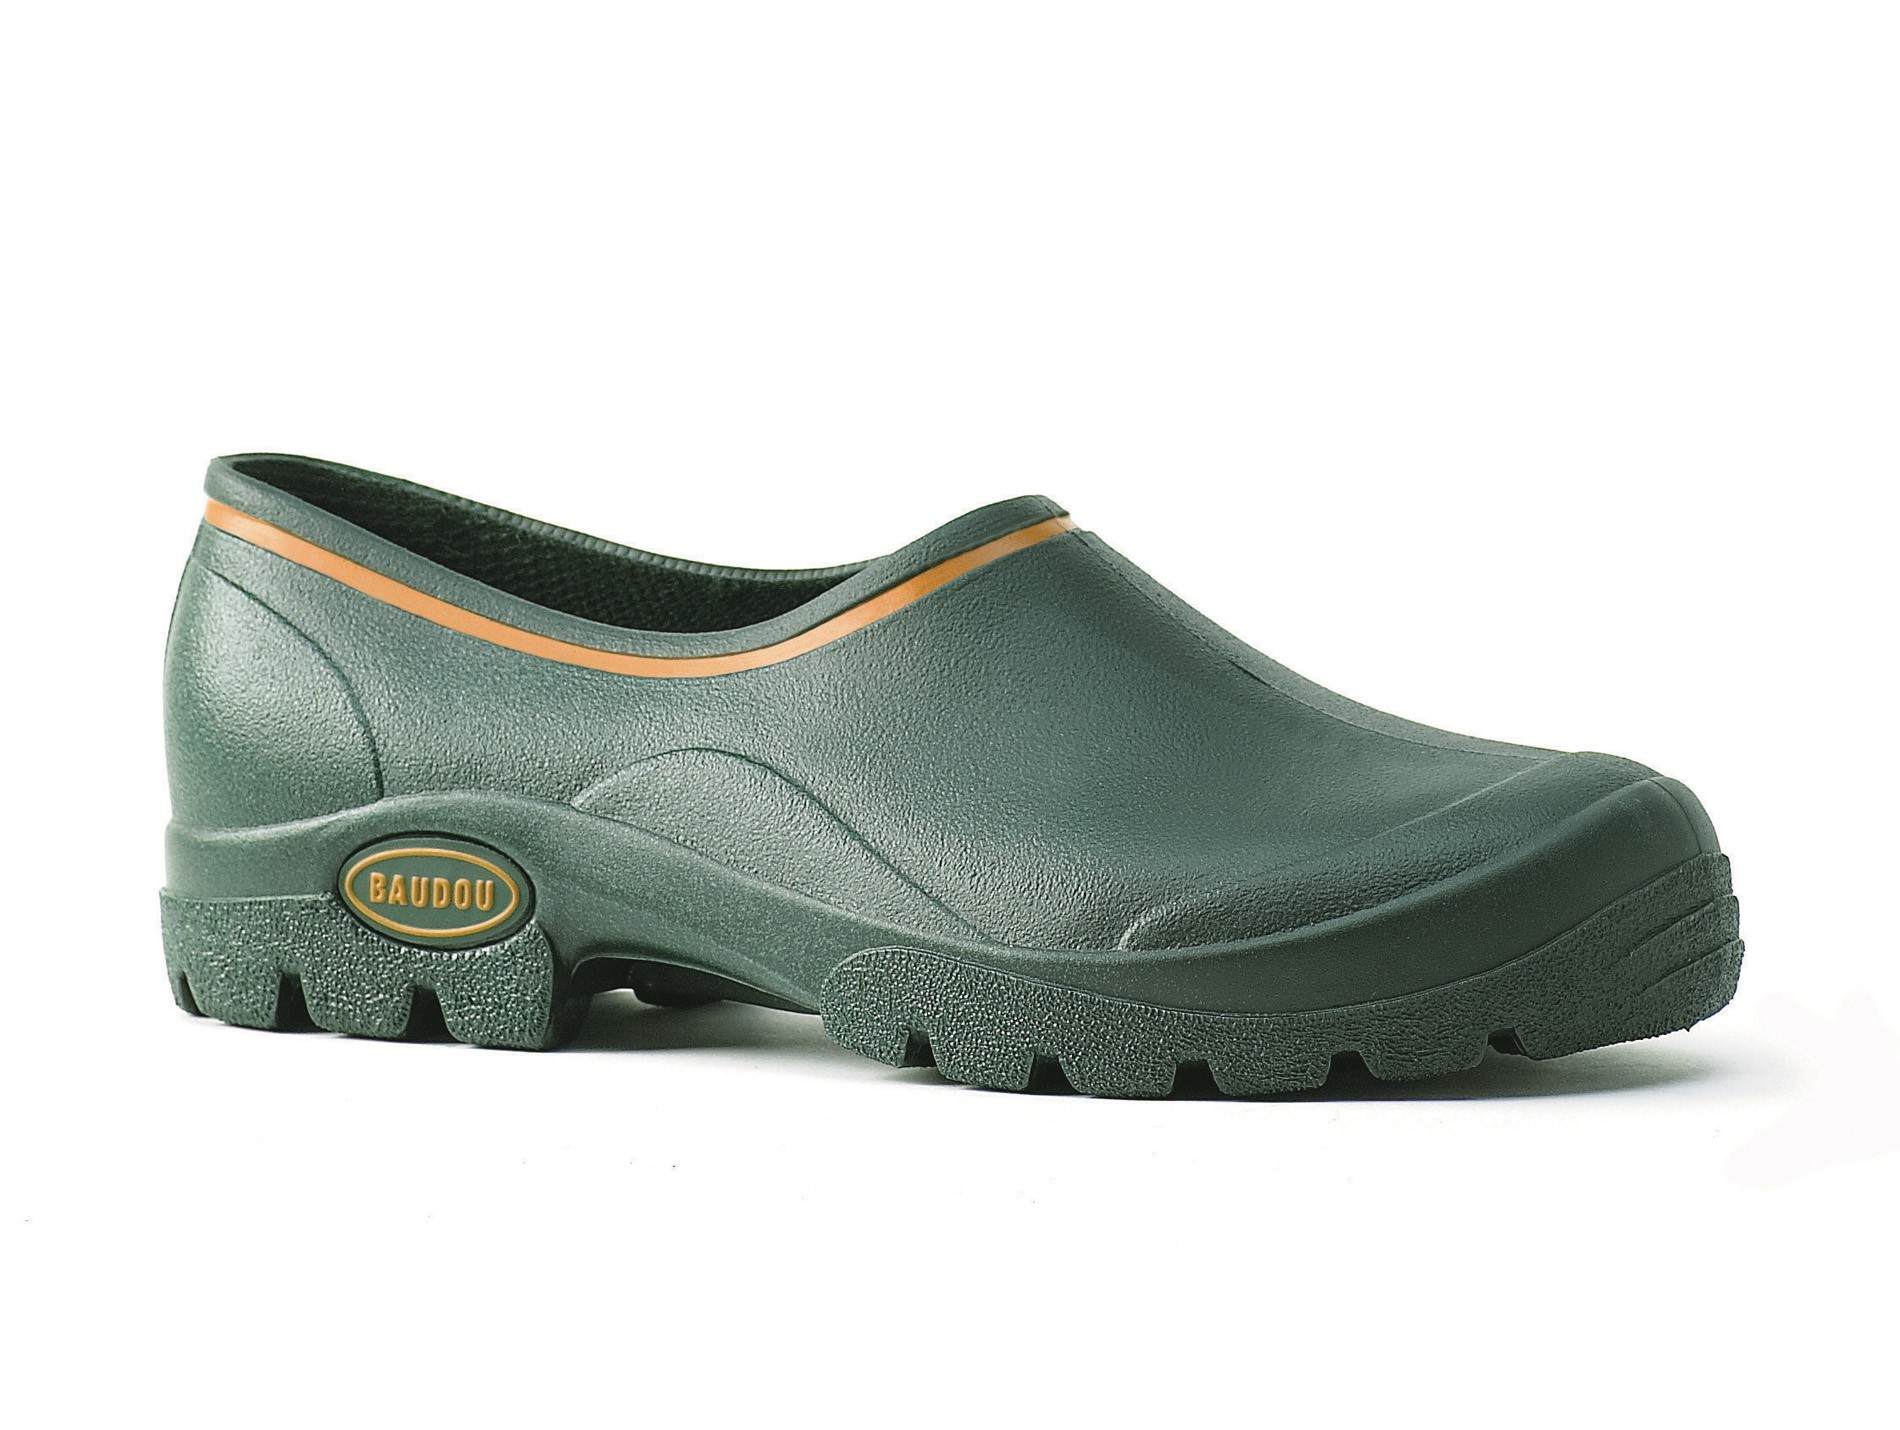 Sabots De Jardin Baudou Cork Vert - Sabots - Chaussures De ... destiné Chaussure De Jardin